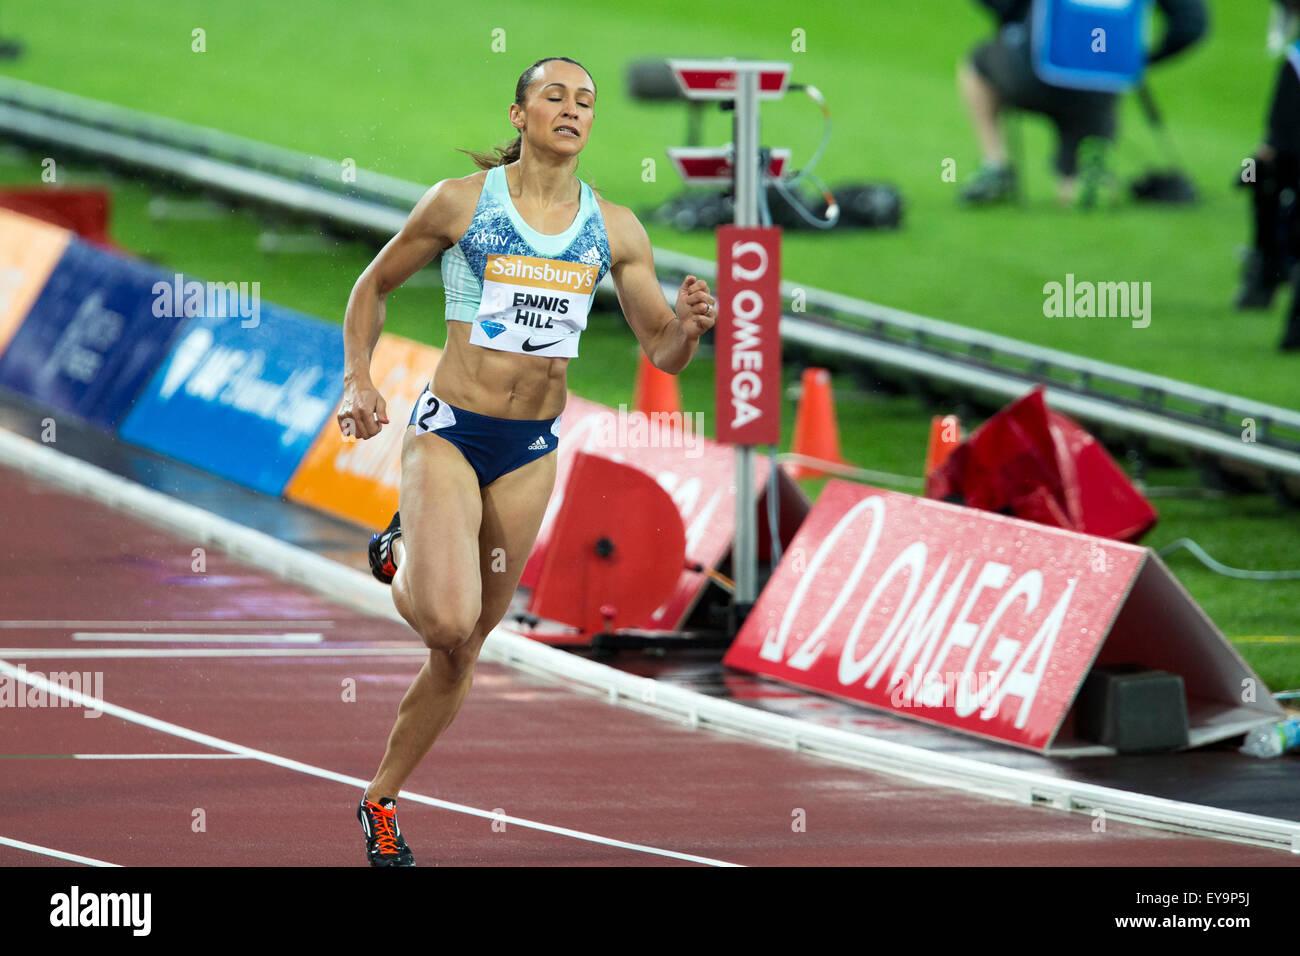 London, UK. 24. Juli 2015. Jessica ENNIS-HILL, Frauen 100m Hürden, Diamond League Sainsbury Jubiläumsspiele, Stockbild